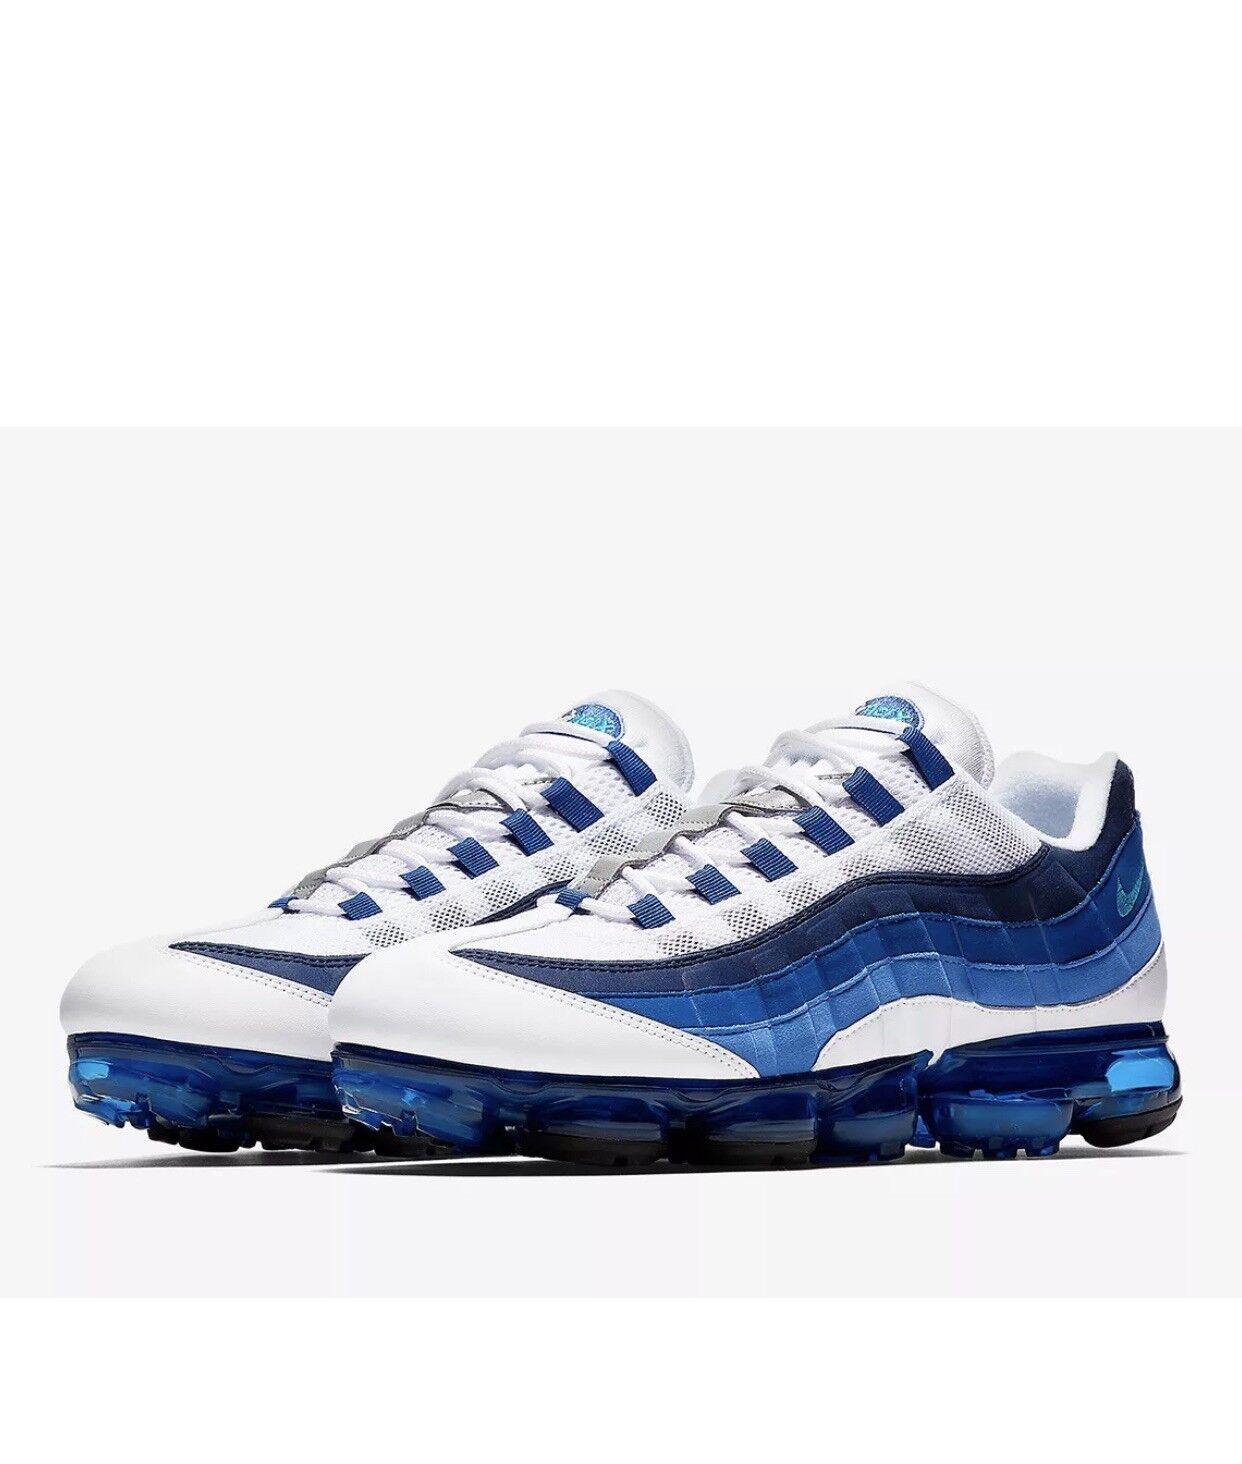 Nike Air VaporMax 95 francese Blu Bianco UK9